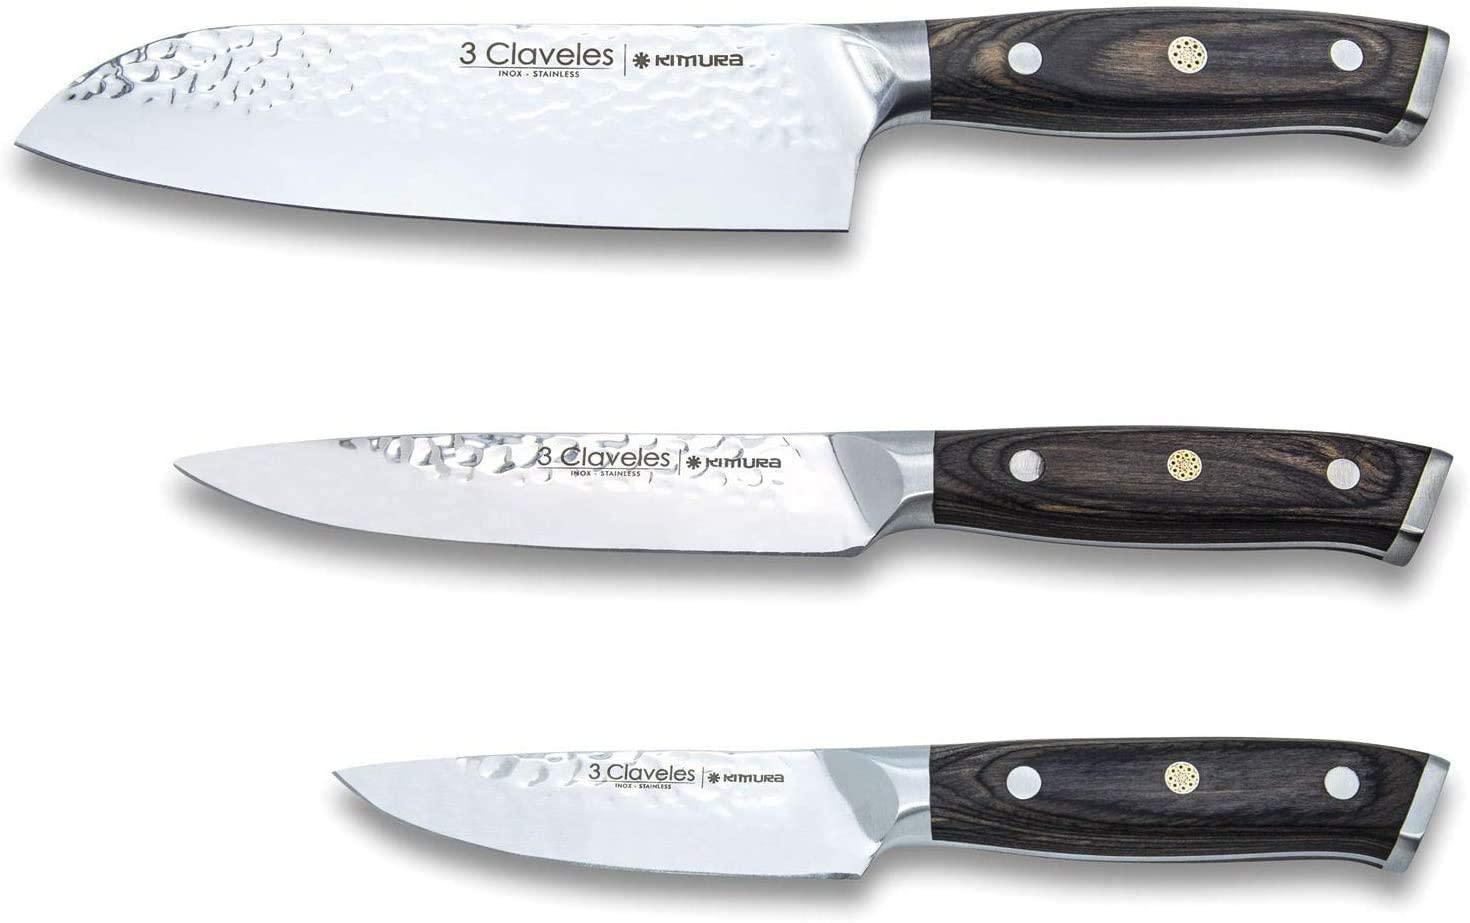 Juego de cuchillos 3 Claveles Kimura